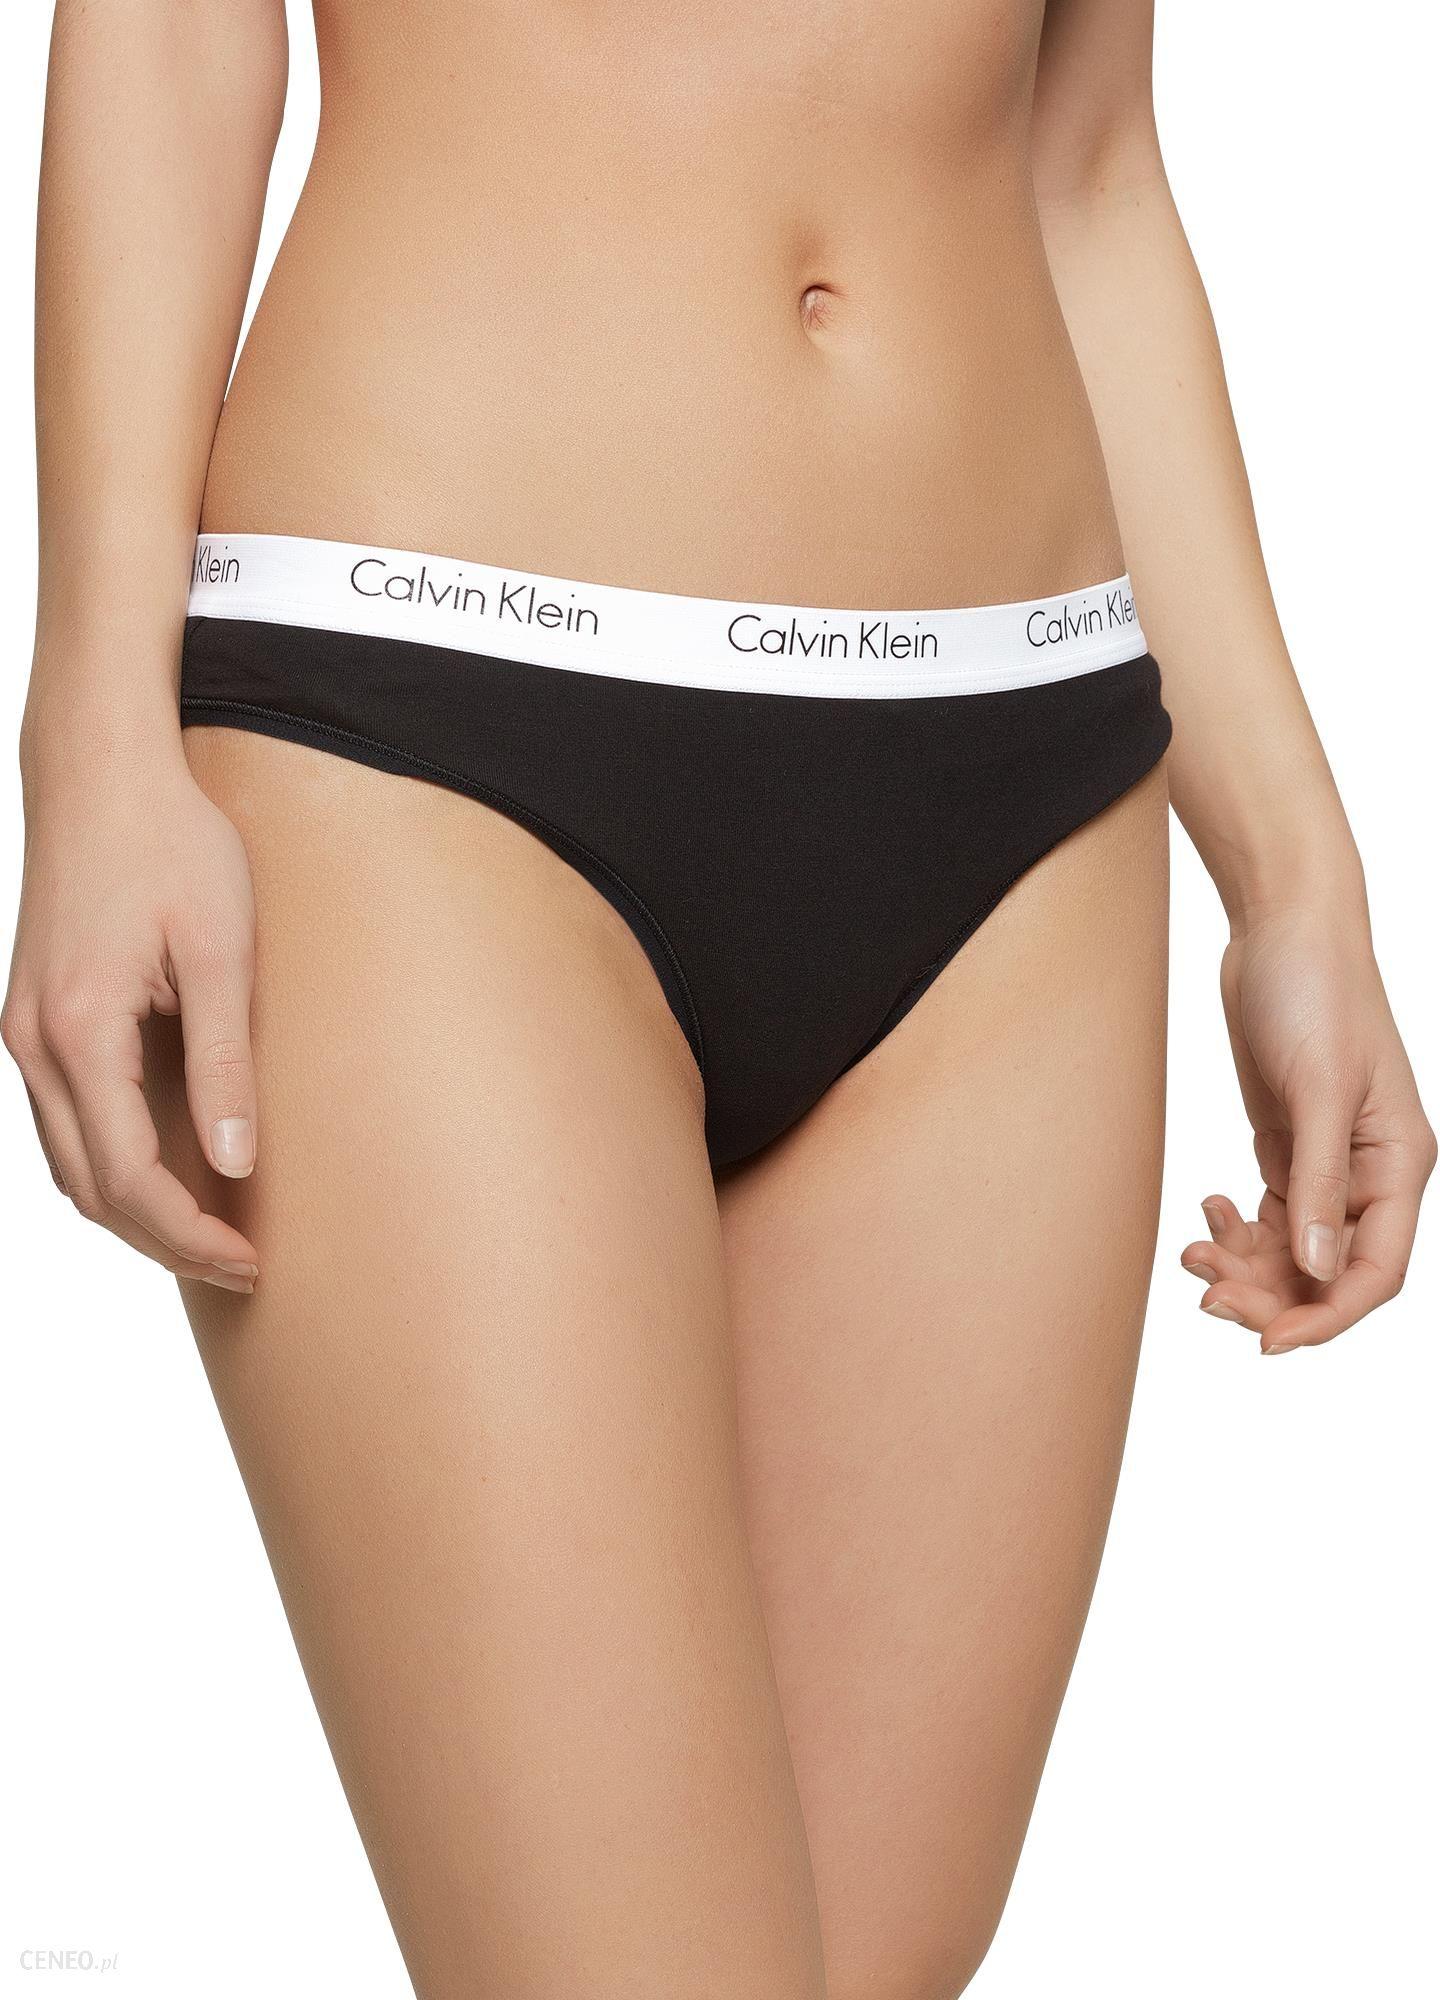 a571232685fb28 Calvin Klein Underwear Stringi '2PK THONG' - Ceny i opinie - Ceneo.pl